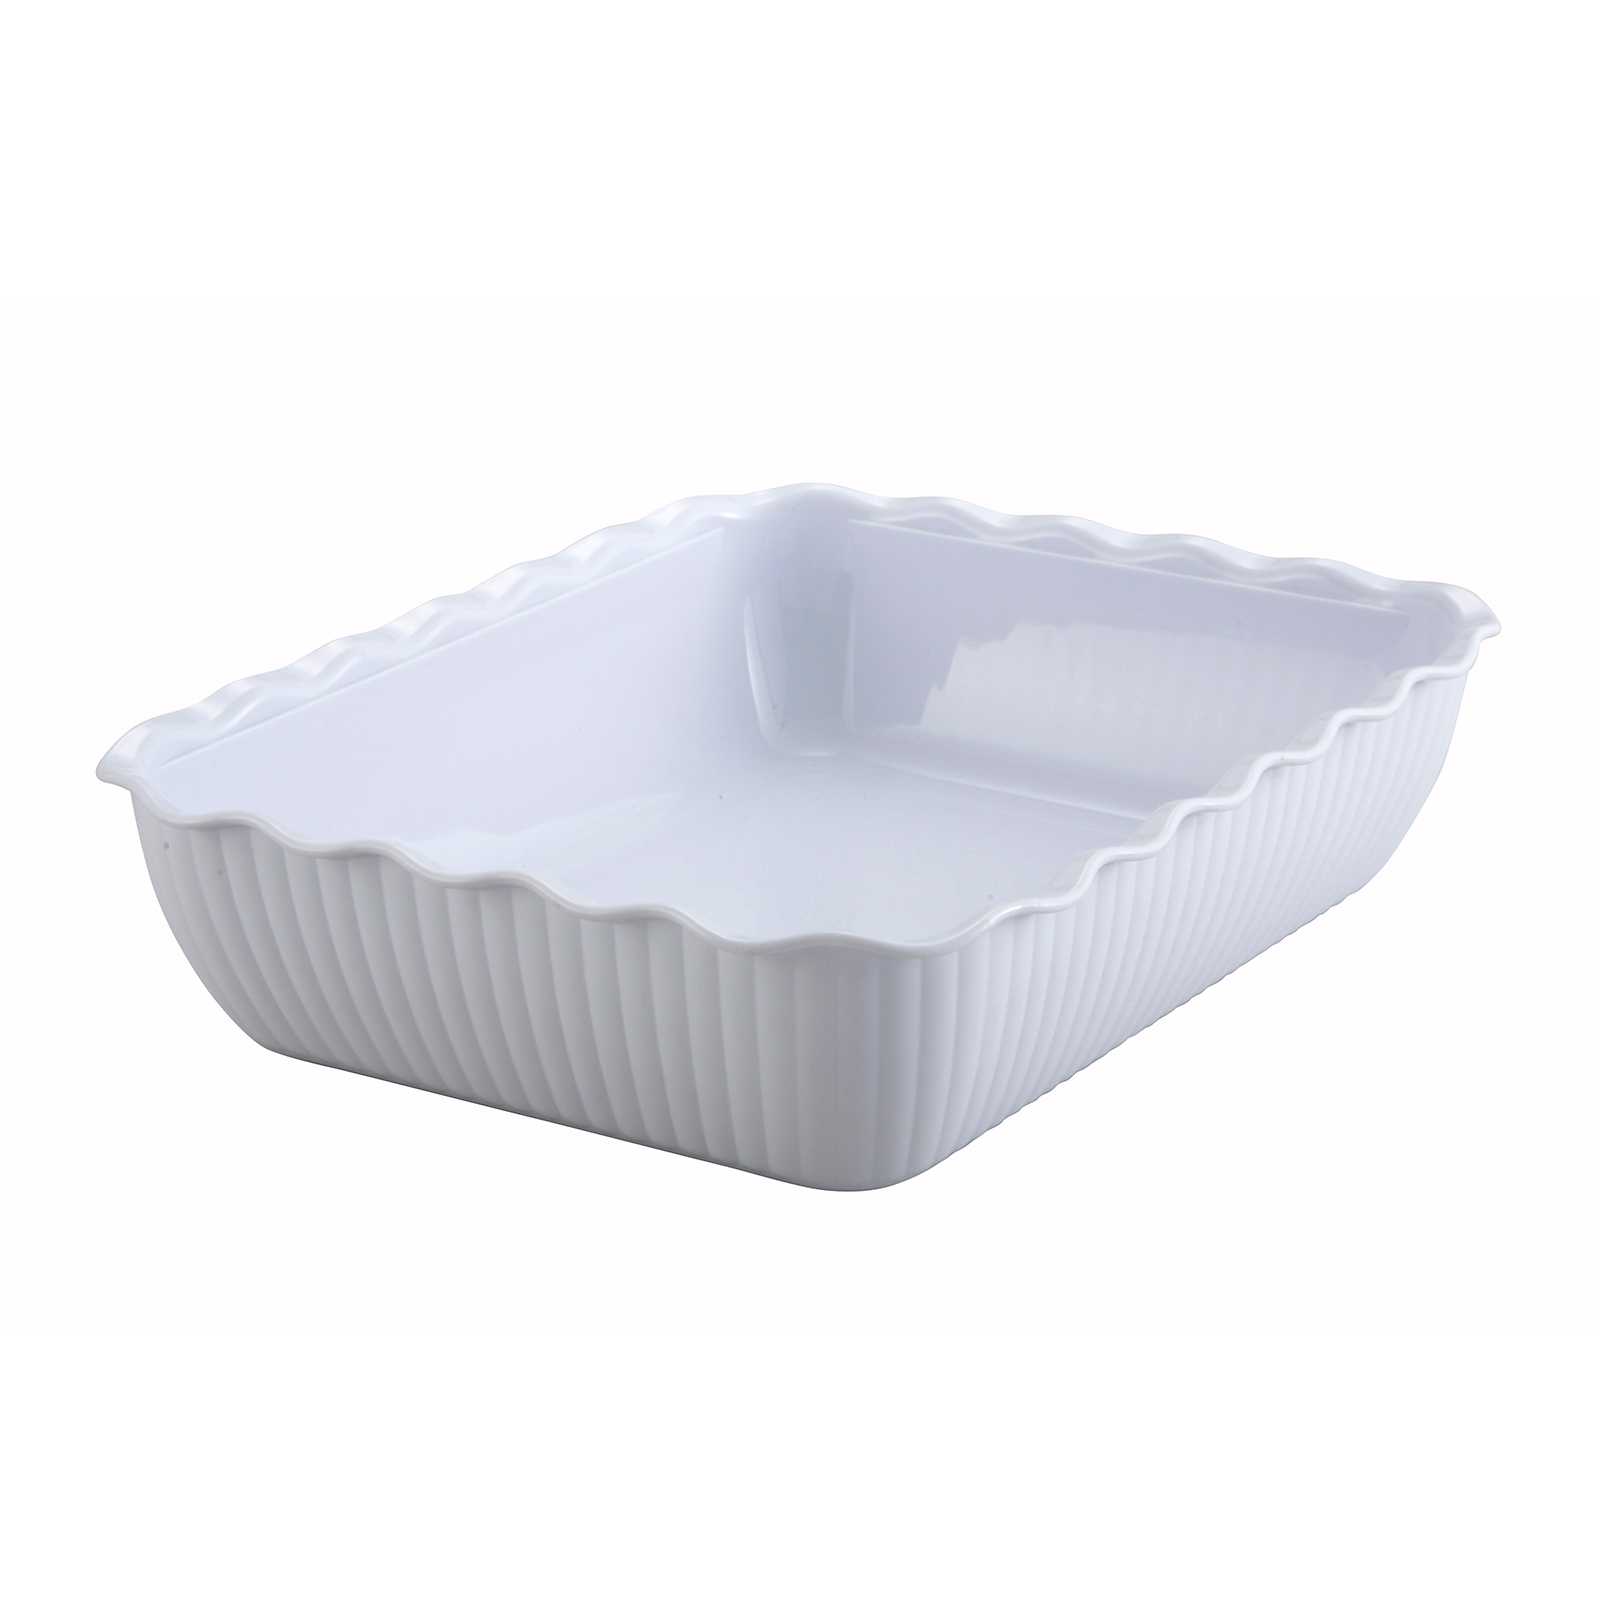 Winco CRK-13W salad crock, plastic